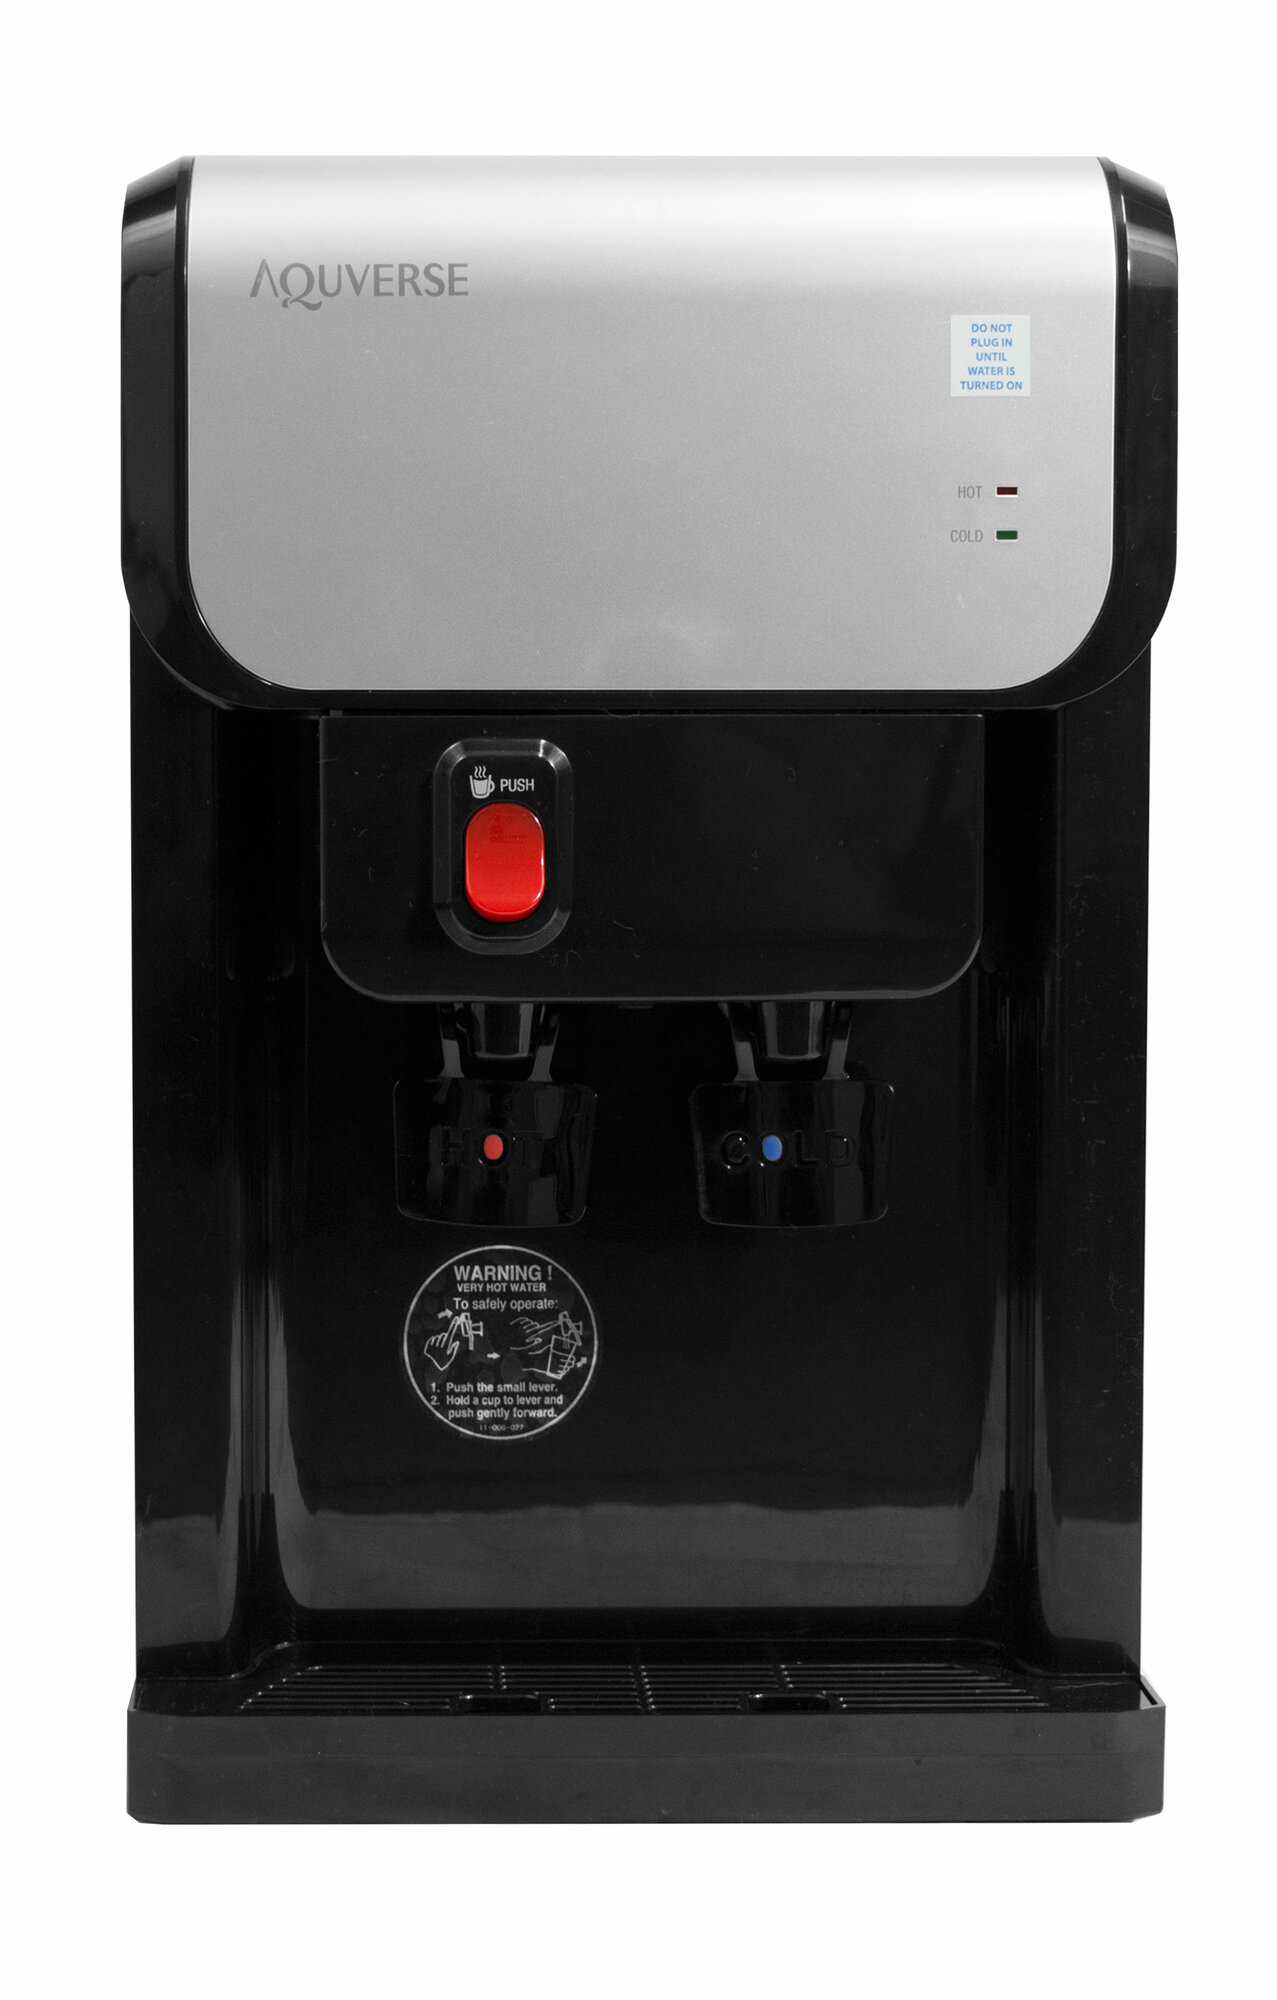 Aquverse Bottleless Countertop Hot And Cold Water Cooler